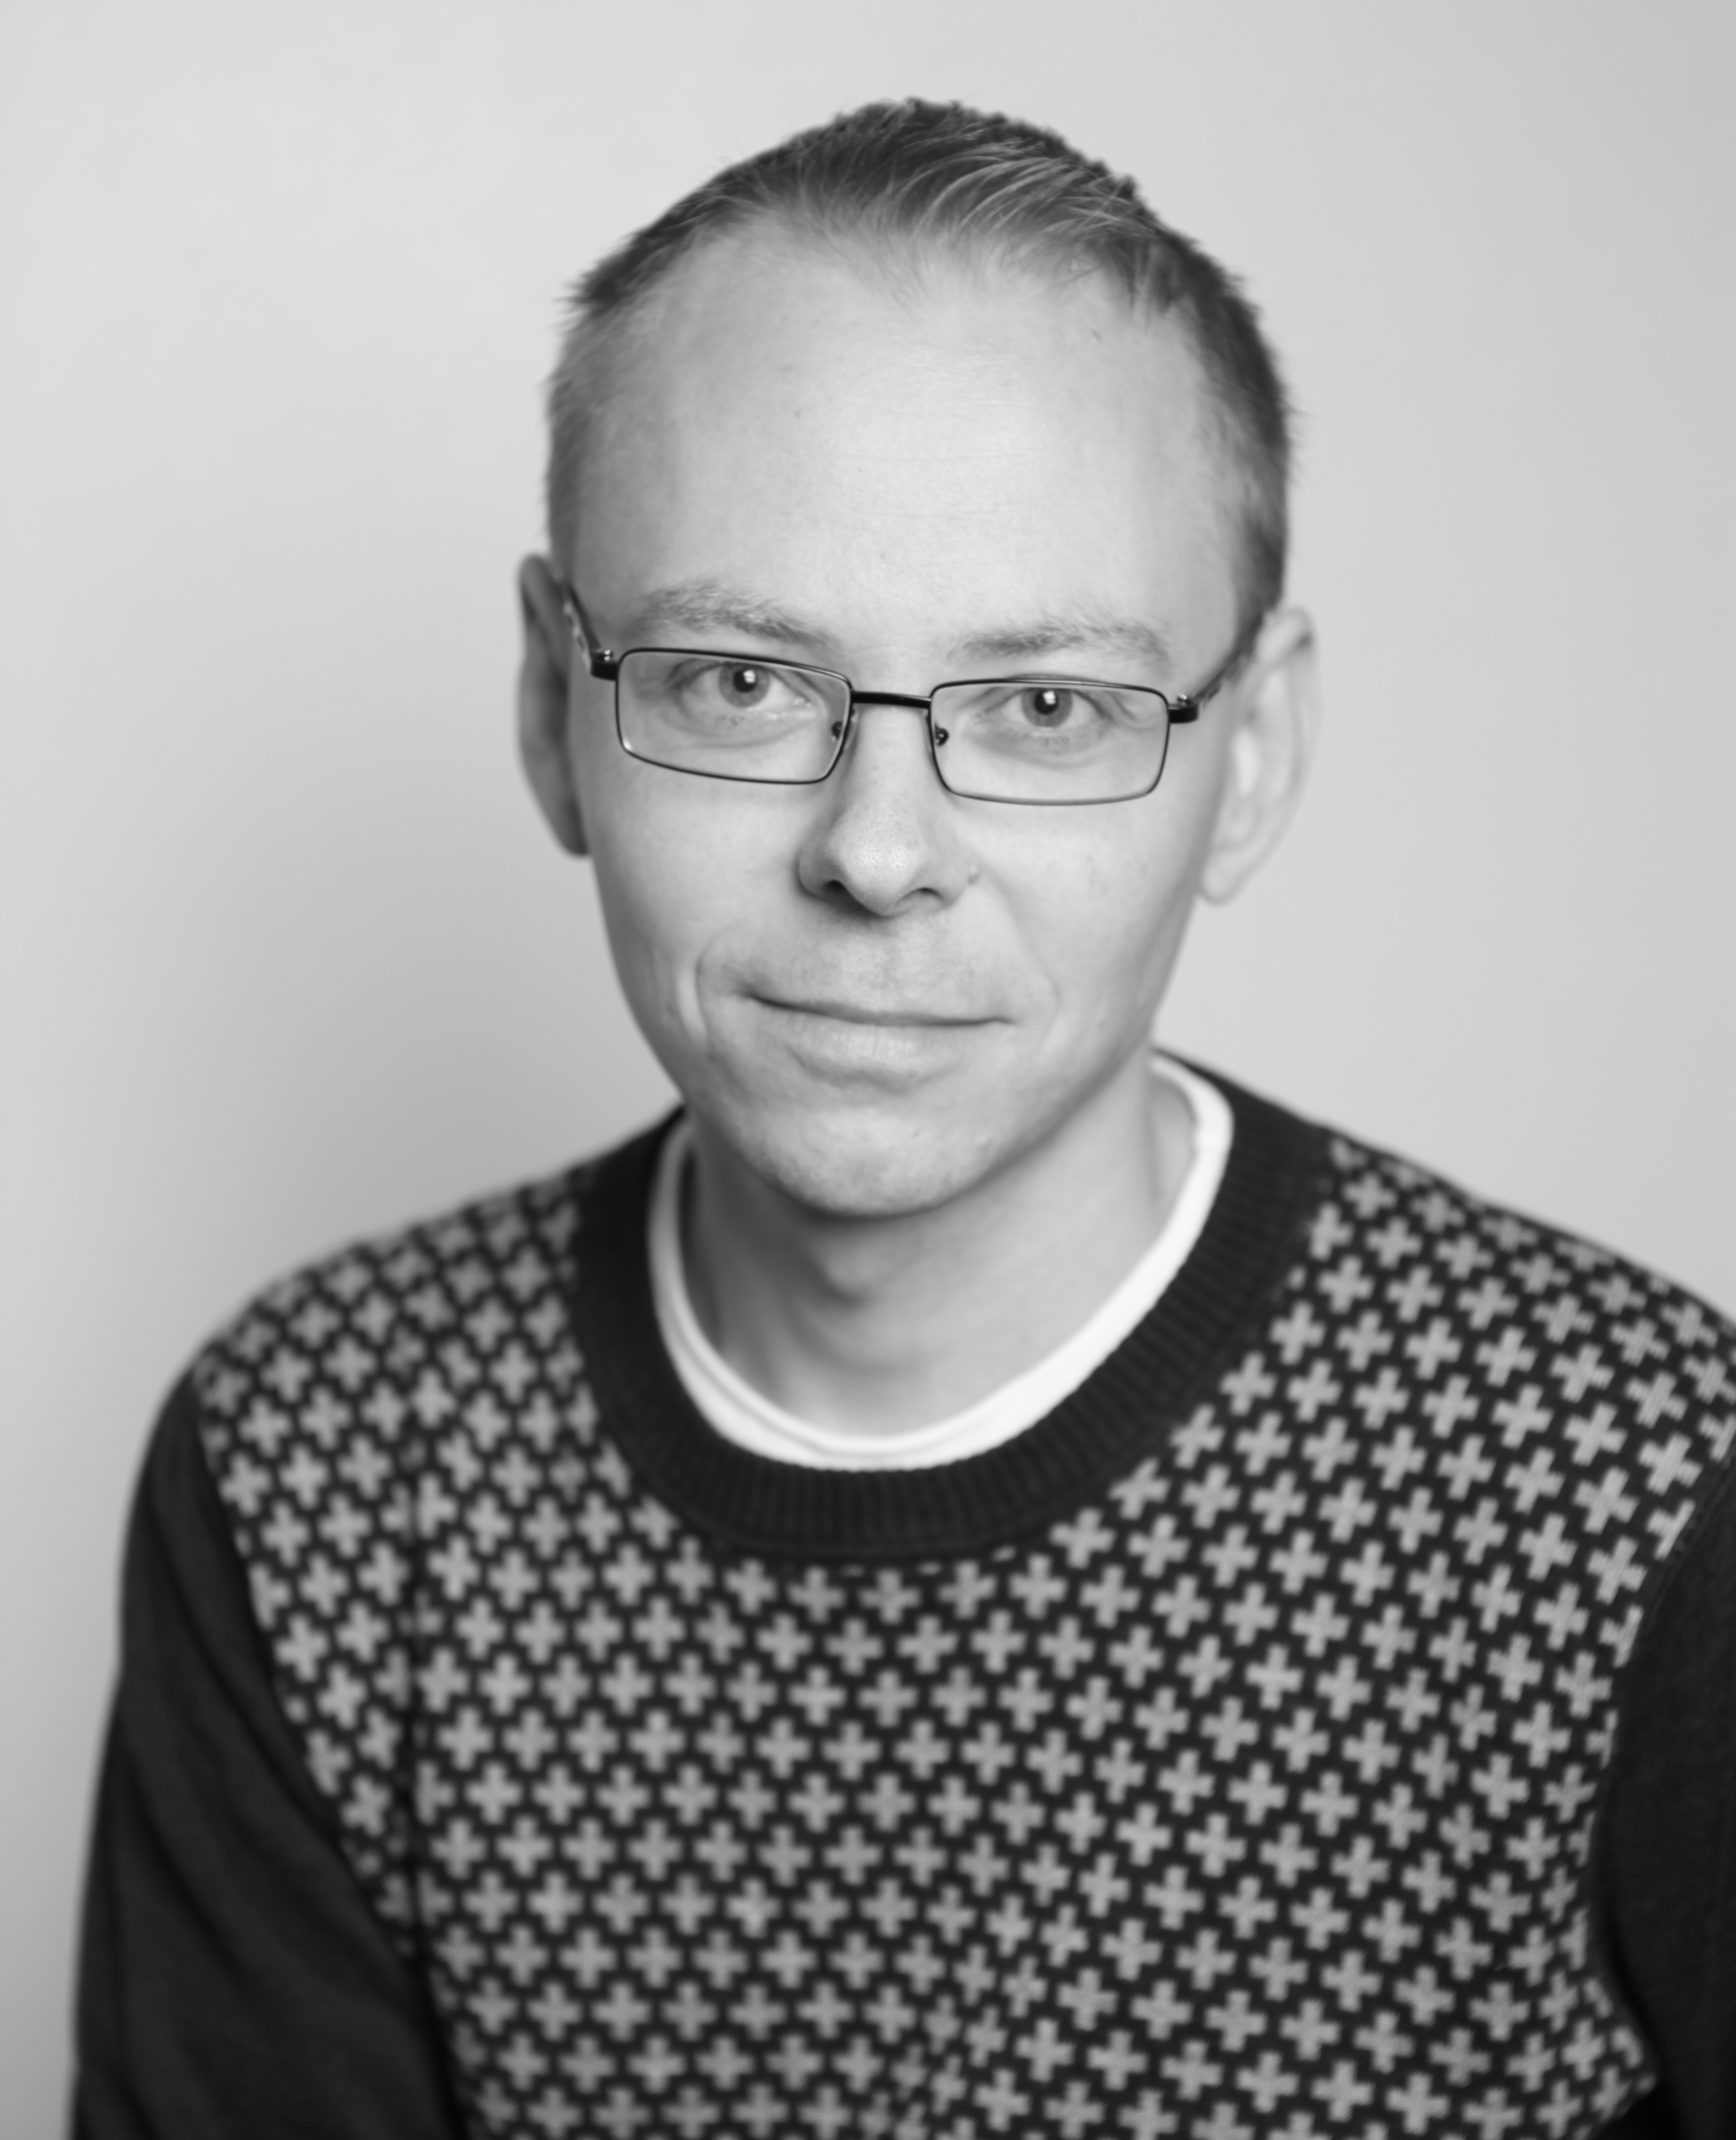 Picture of Jens Lindeblad